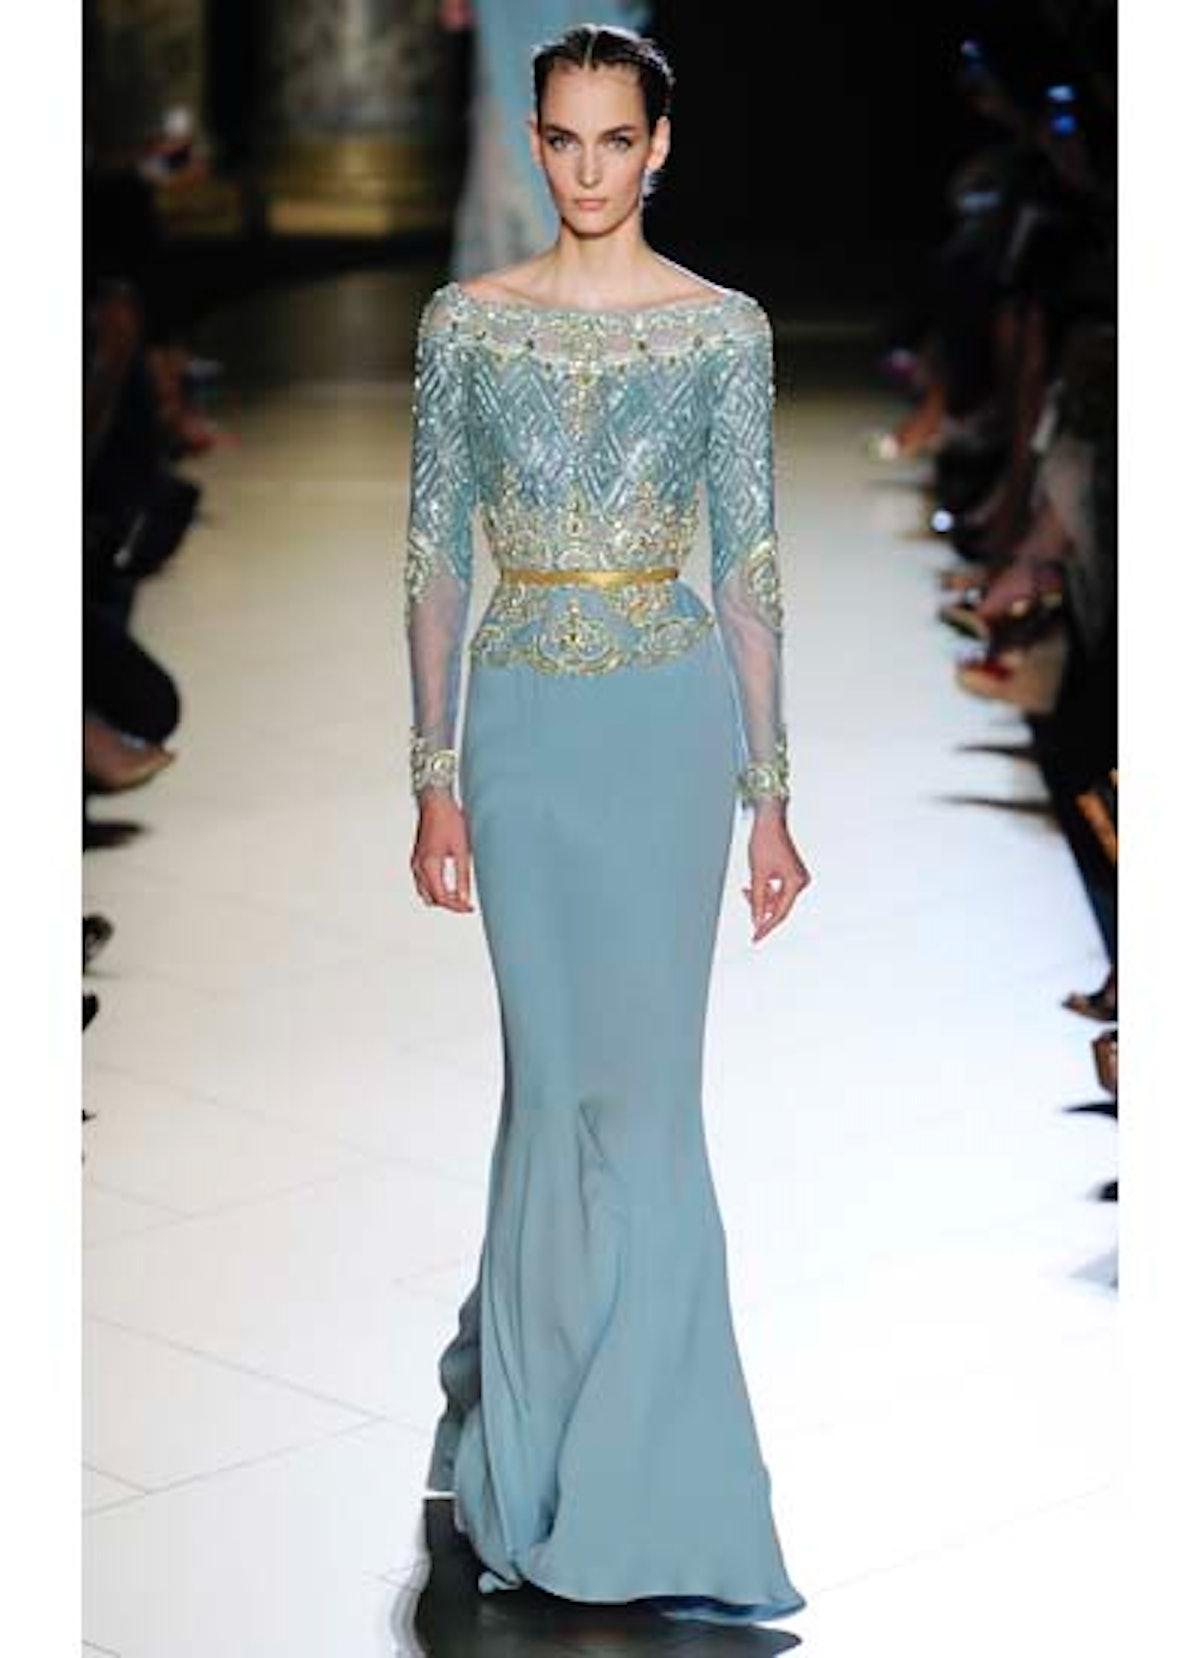 fass-elie-saab-couture-2012-runway-20-v.jpg